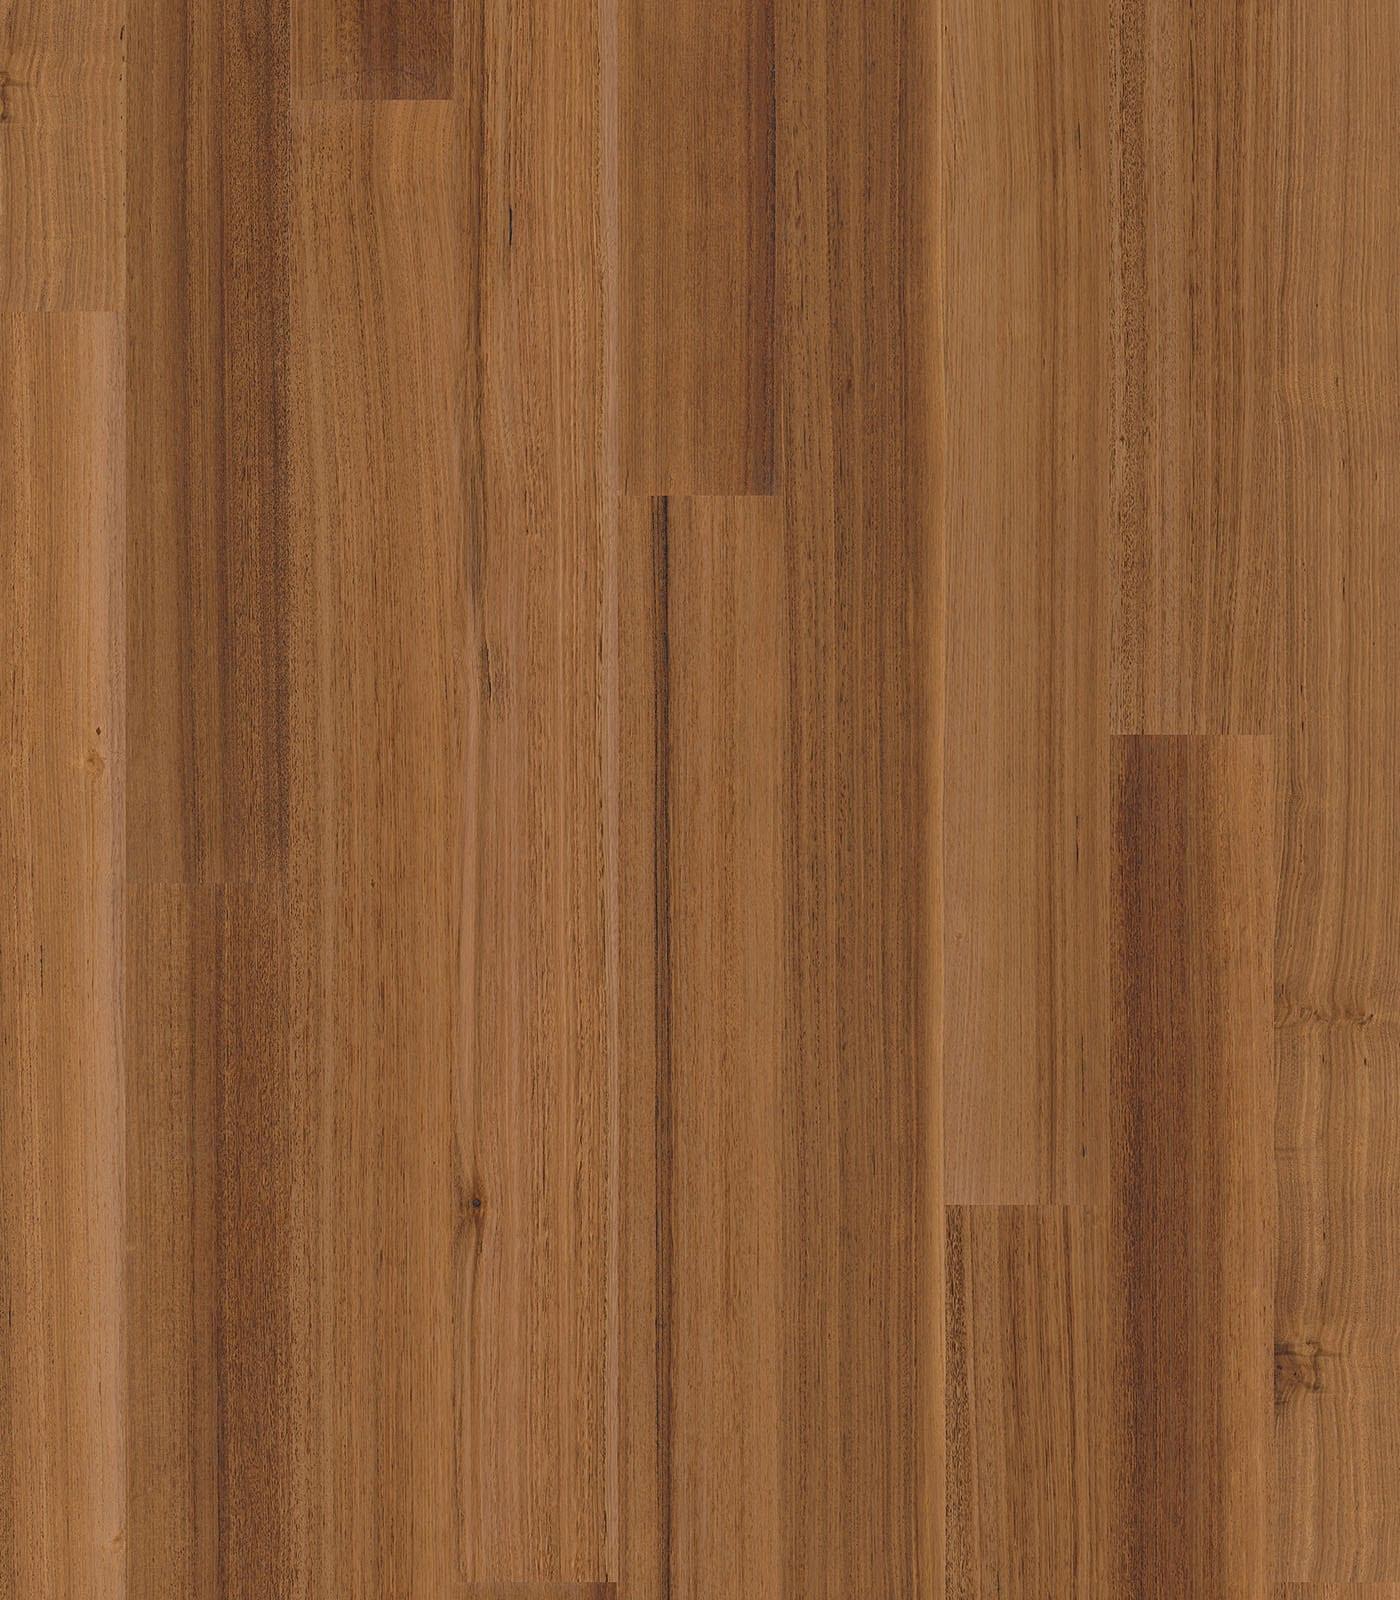 Fremantle-Tasmanian Oak Floors-After Oak Collection-flat